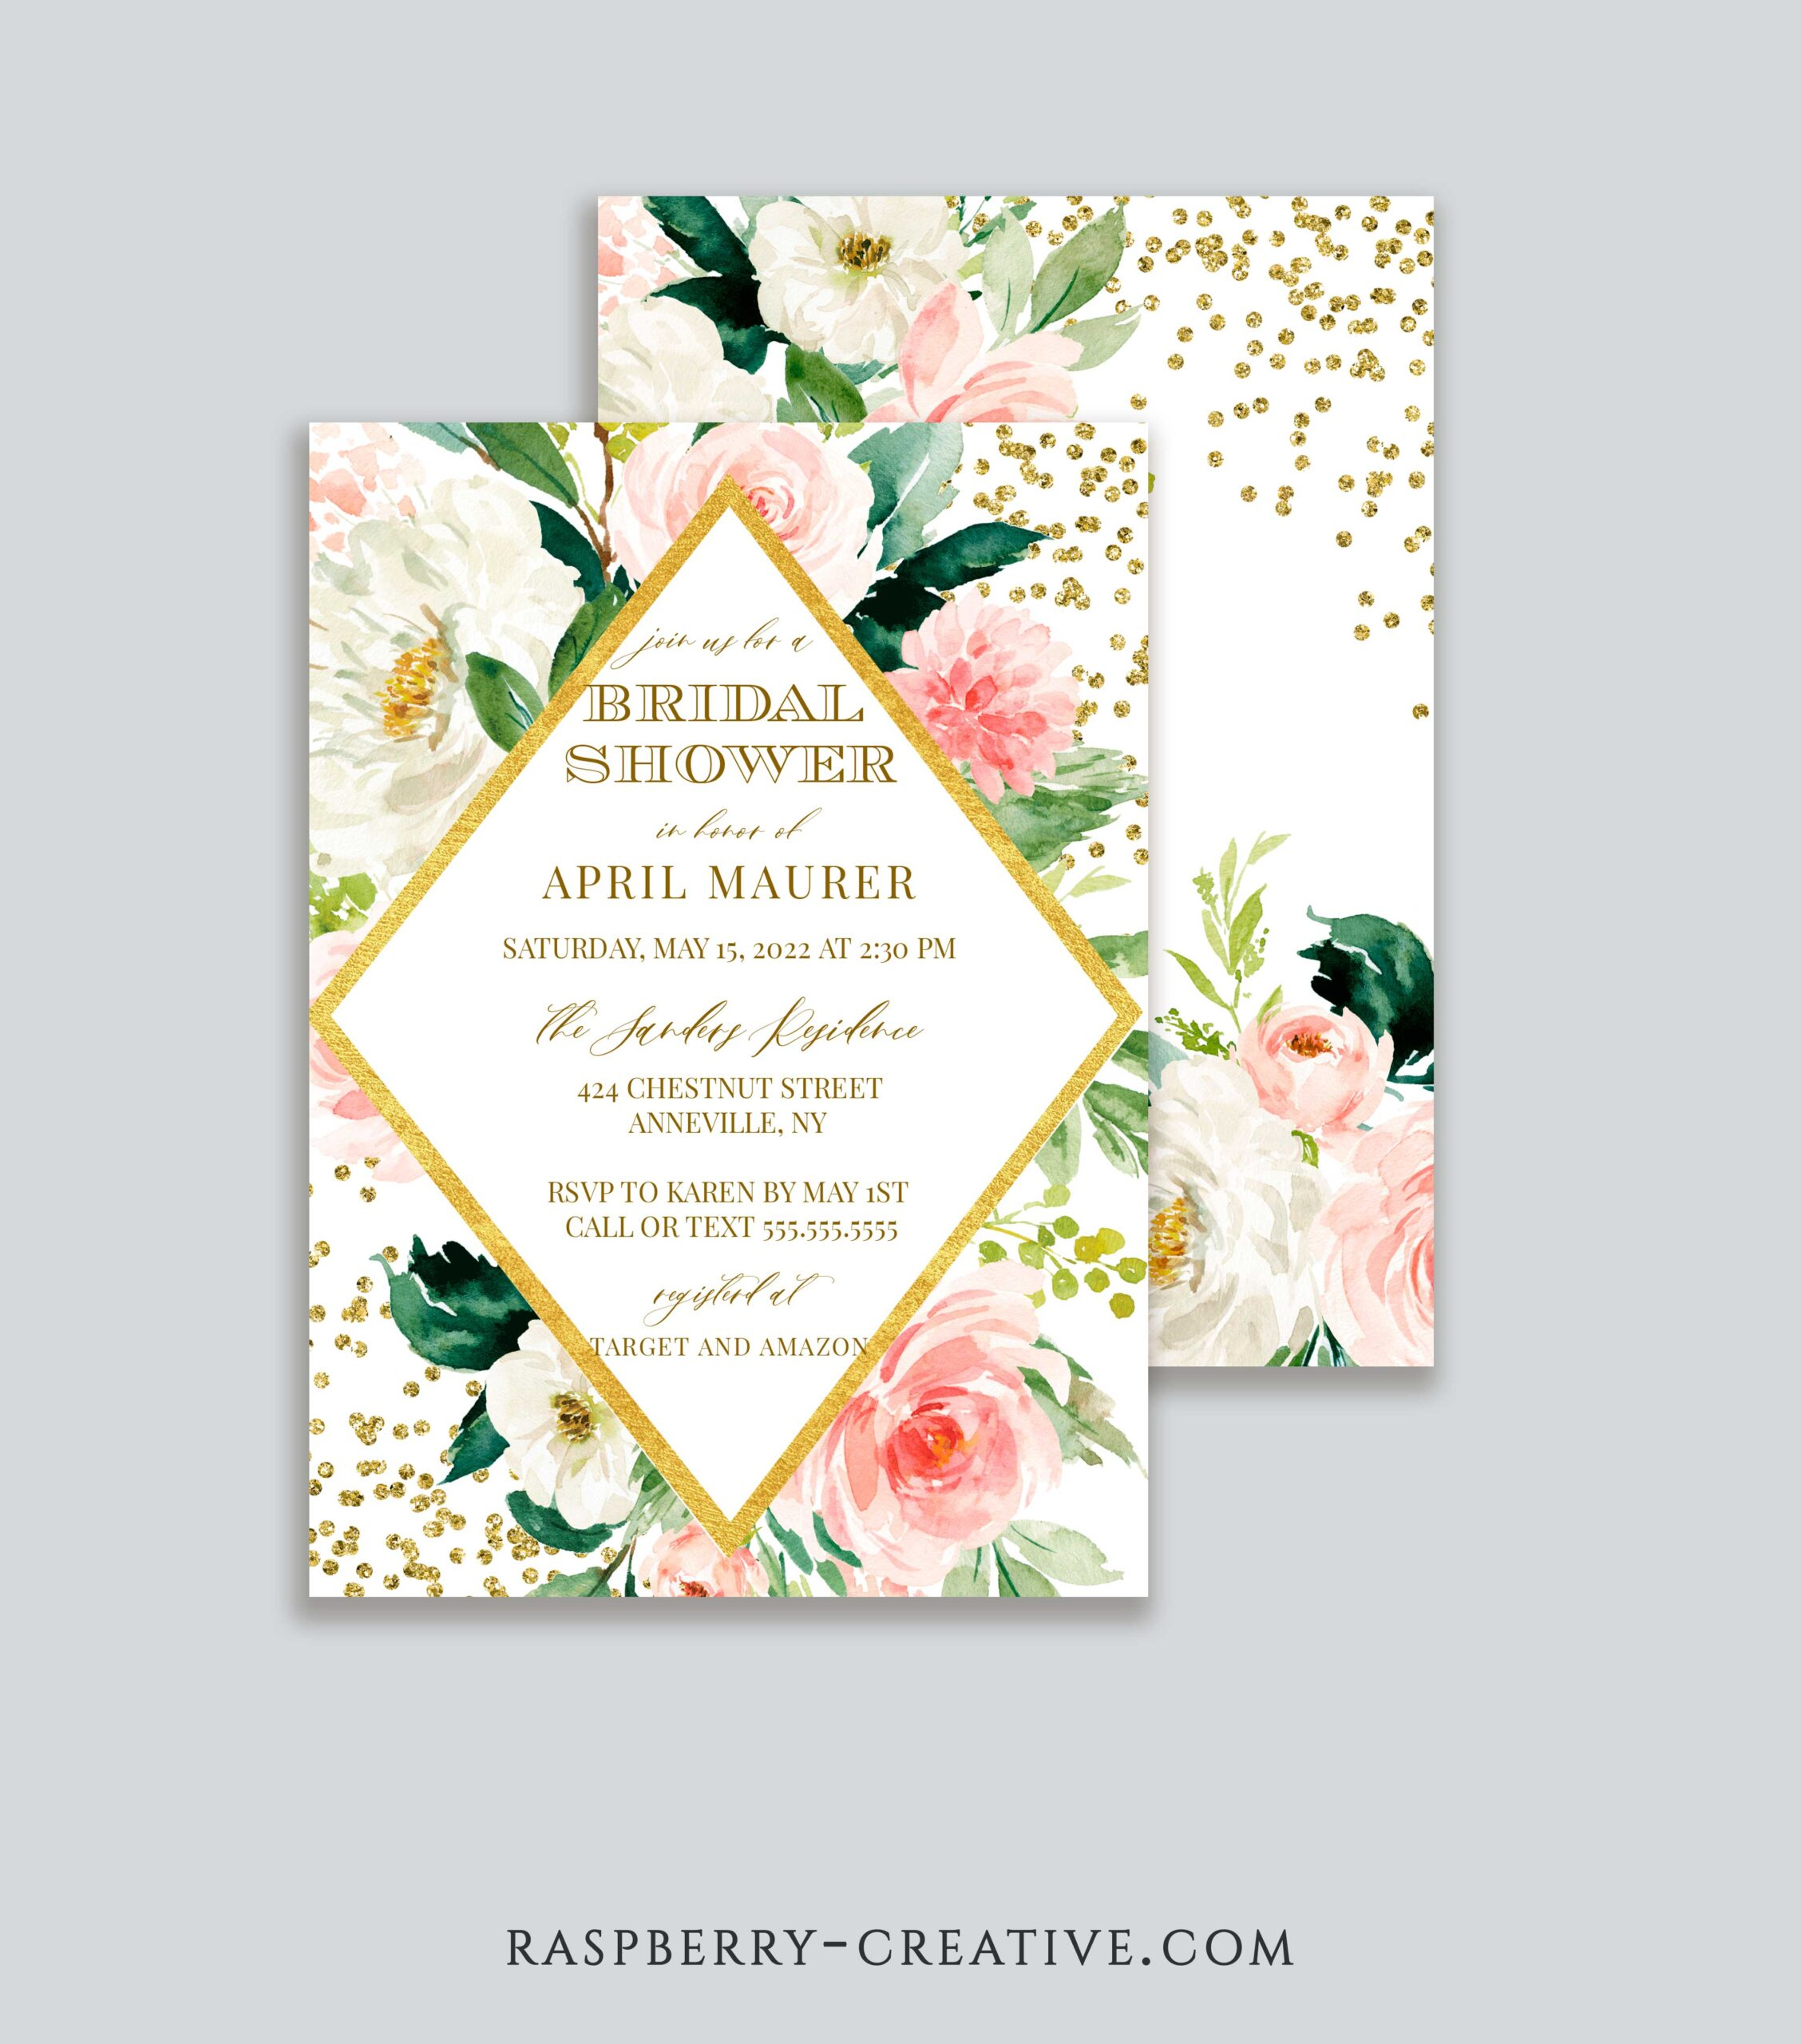 Blush and Gold Diamond Bridal Shower Invitation